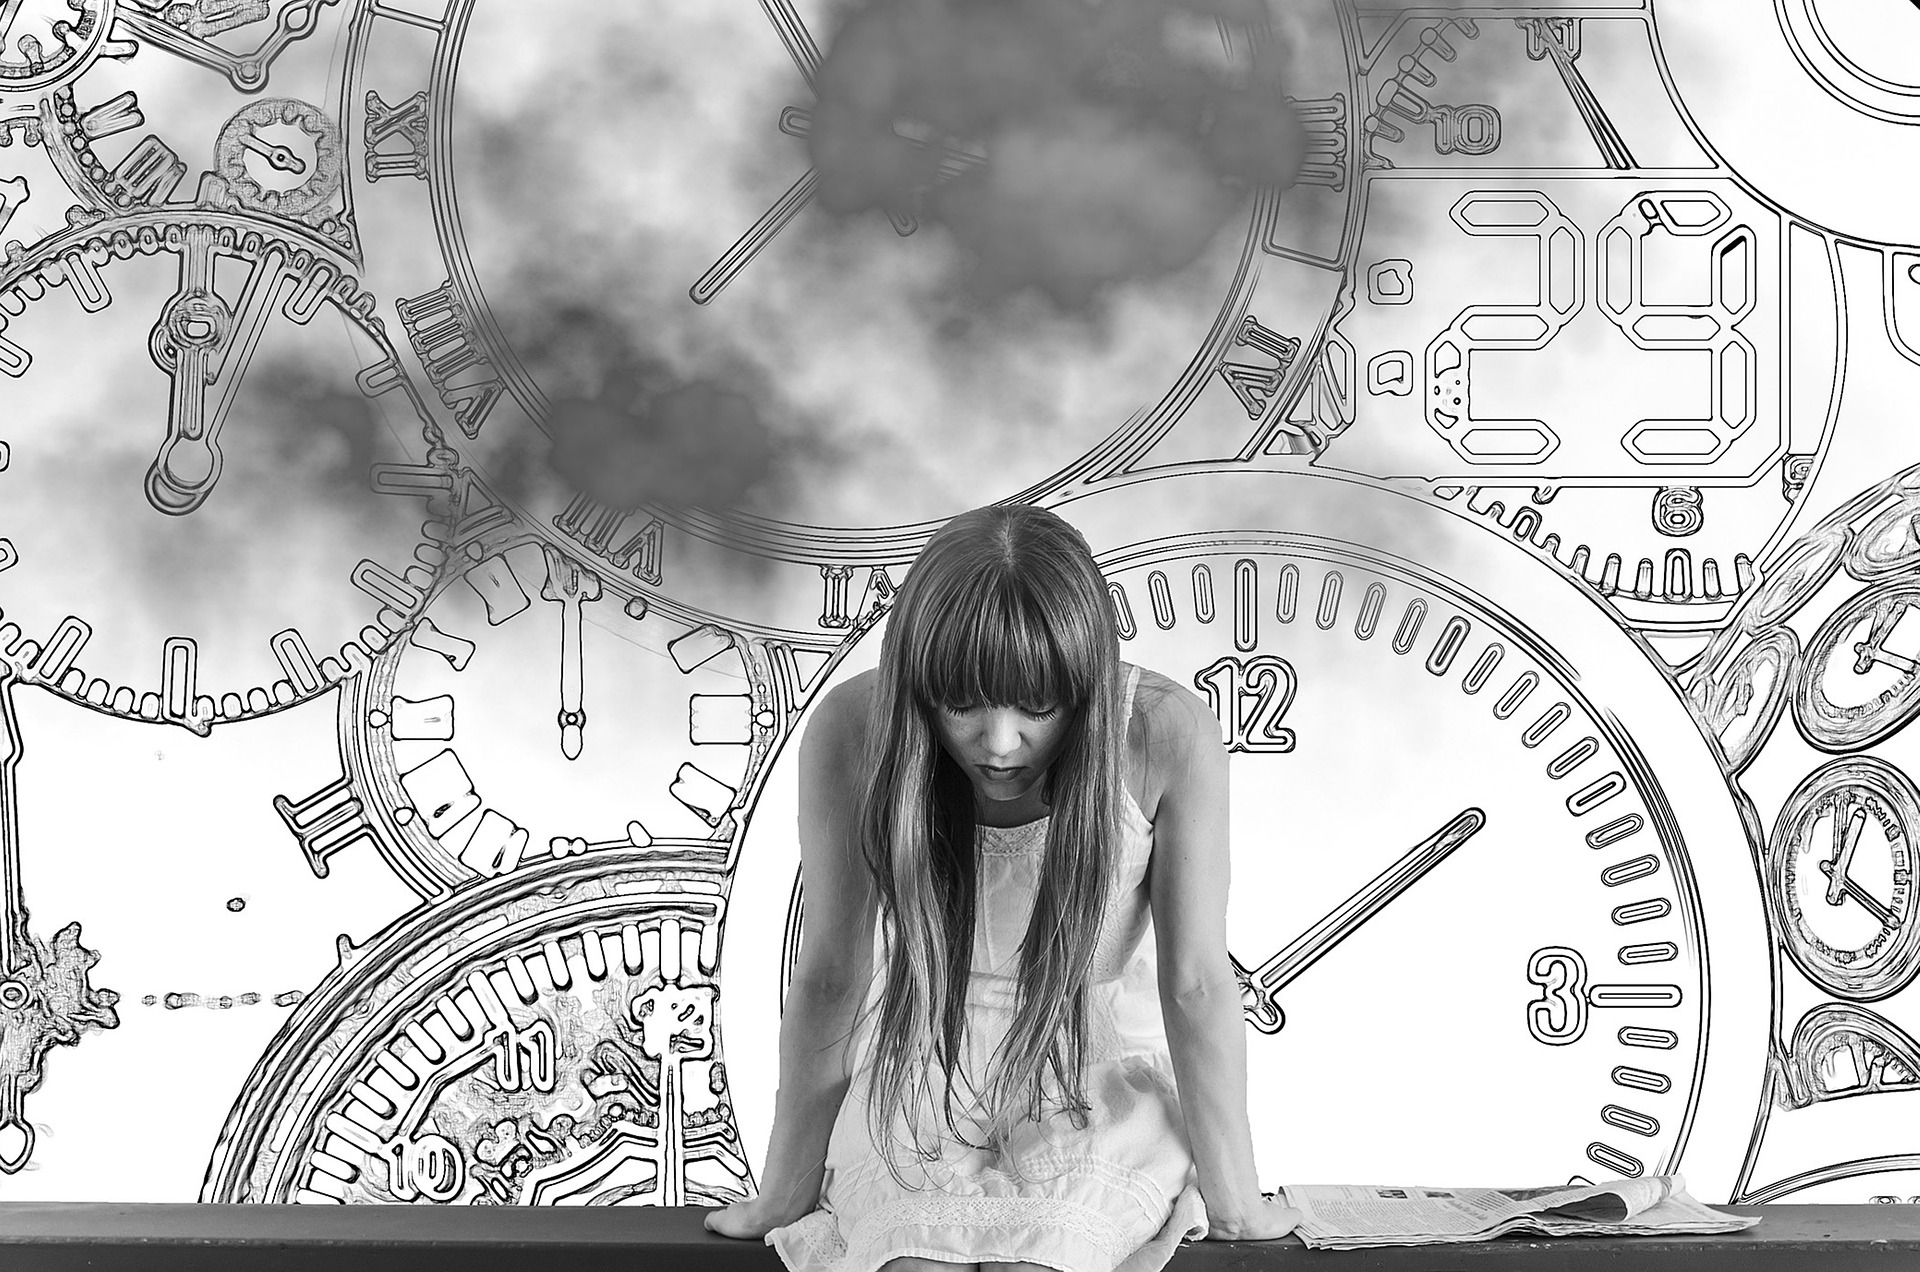 stres kvůli nepřipravenosti